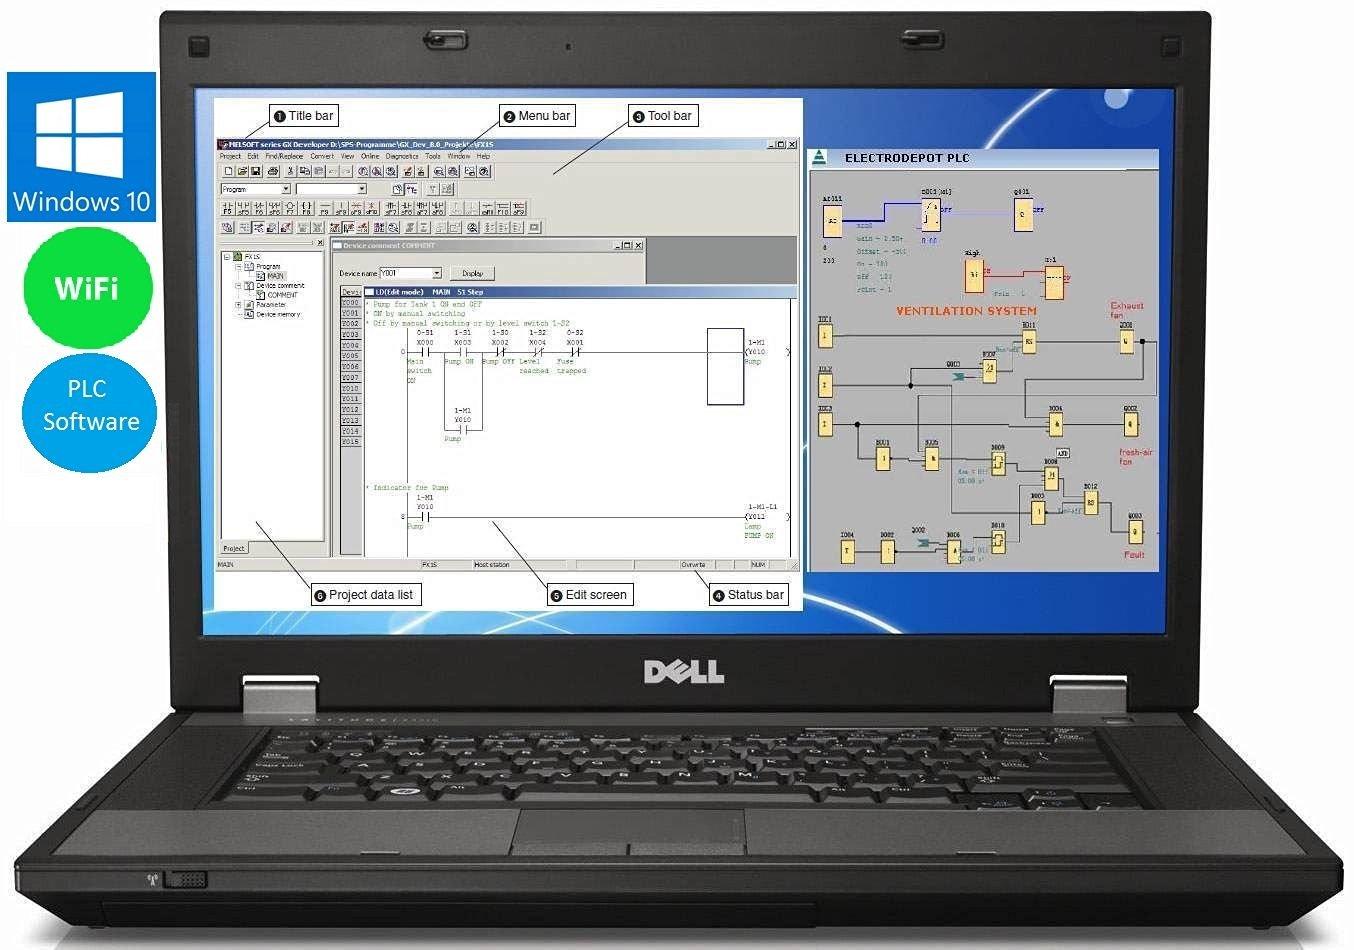 Cheap Abb Plc Software, find Abb Plc Software deals on line